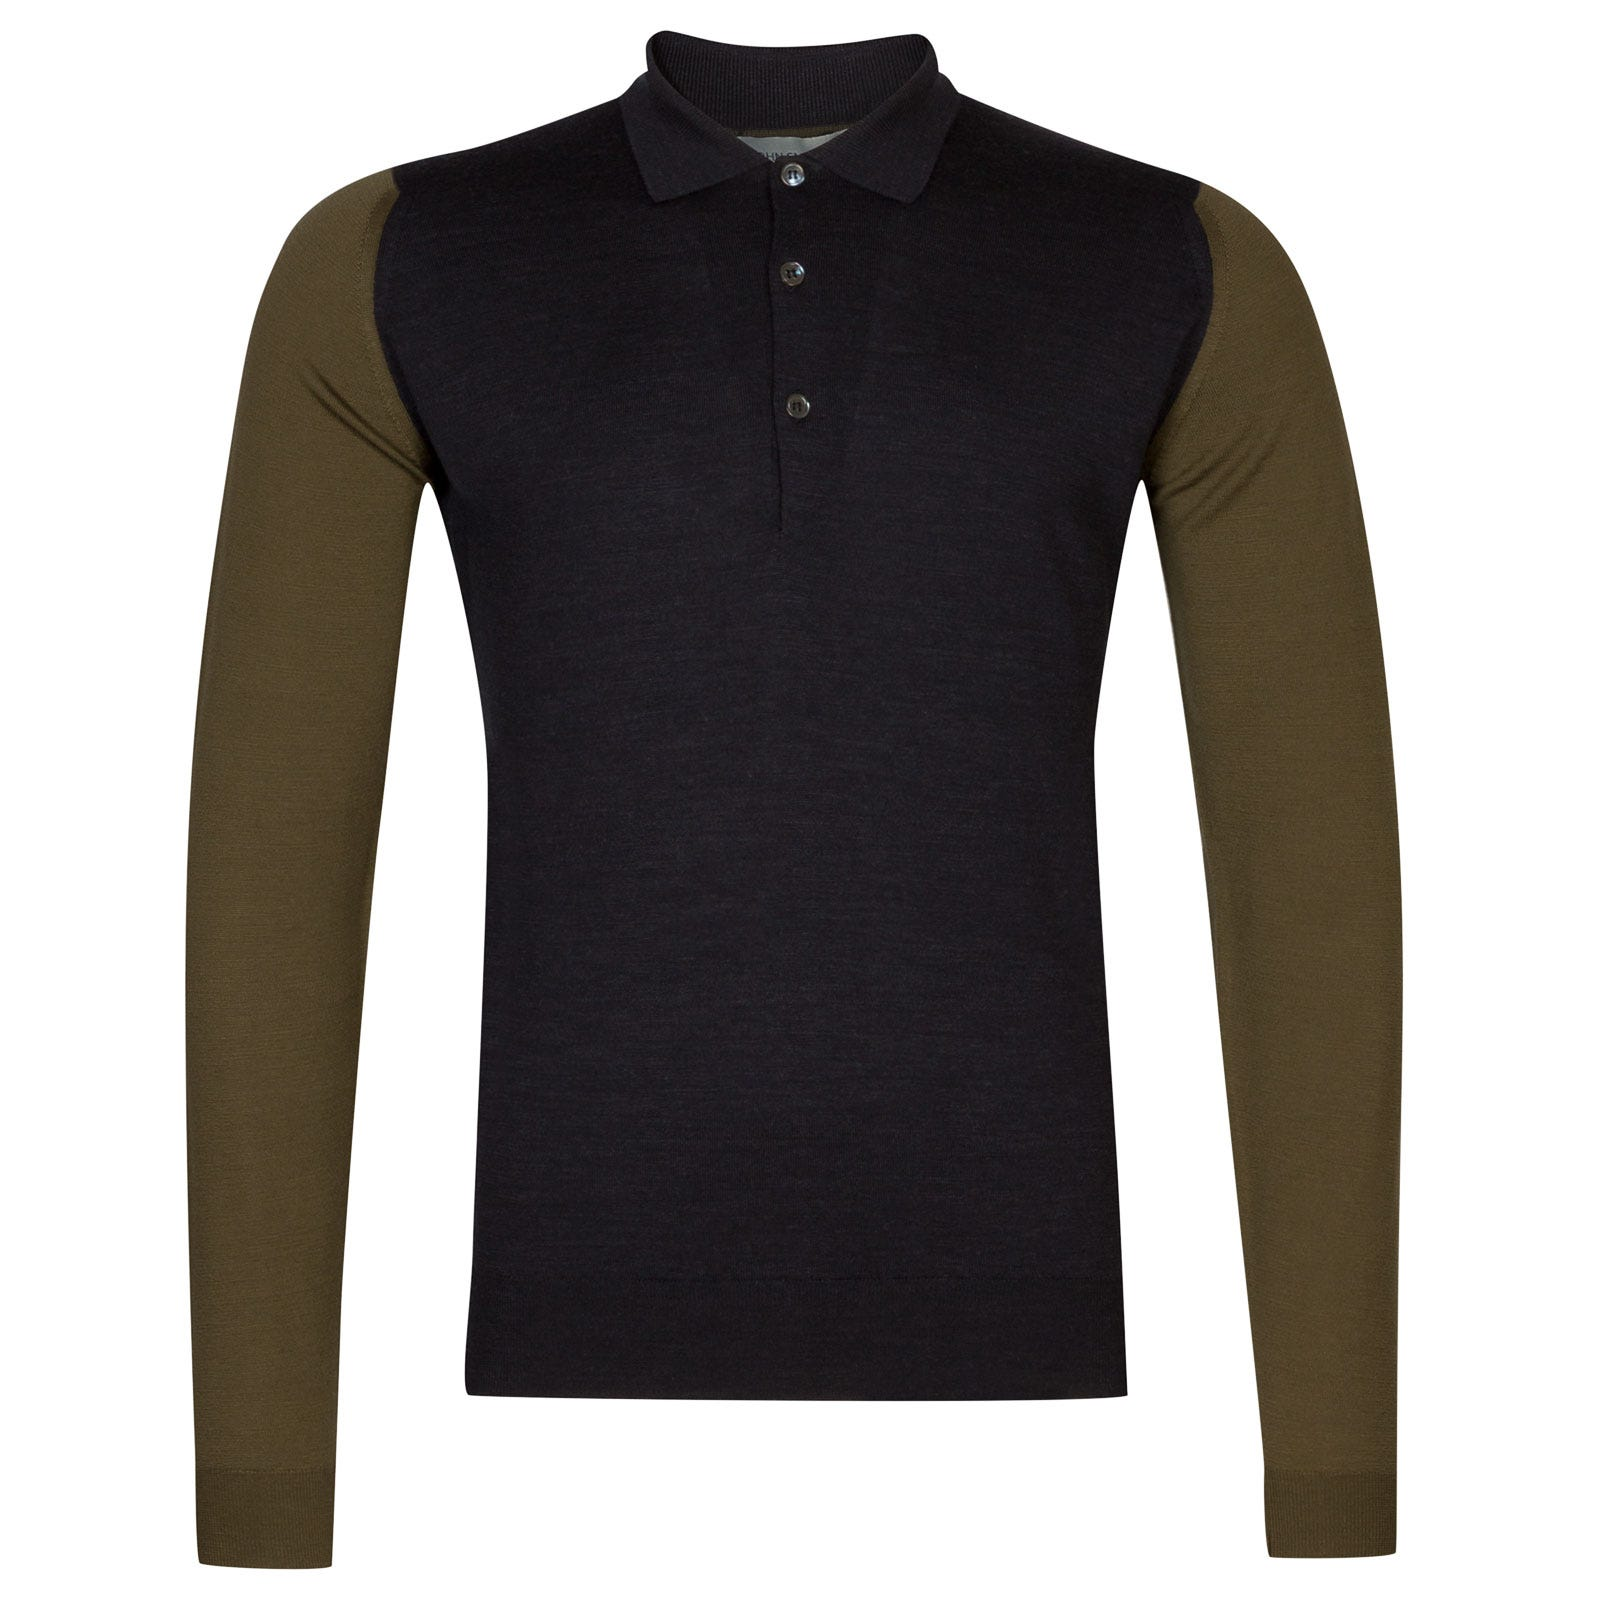 John Smedley Brightgate Merino Wool Shirt in Hepburn Smoke/Kielder